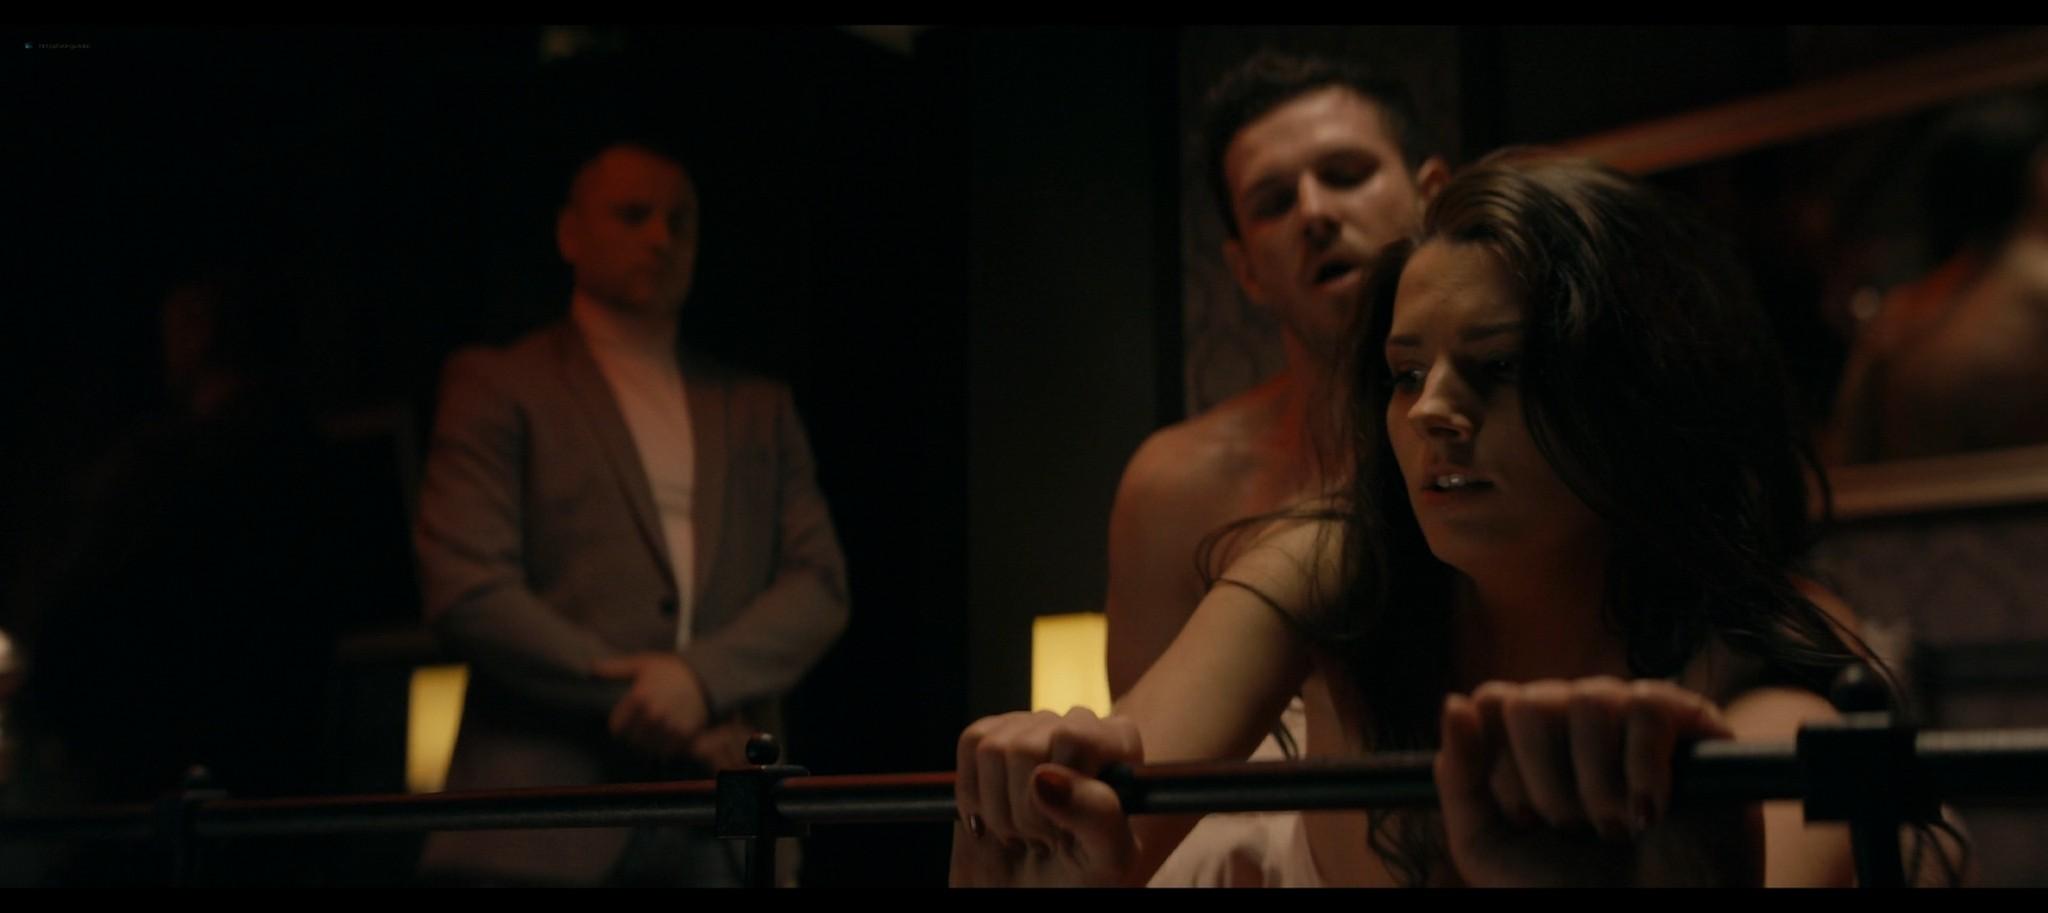 Katarzyna Warnke sex Aleksandra Nowicka Karolina Dziuba nude Petla PL 2020 1080 BluRay 08